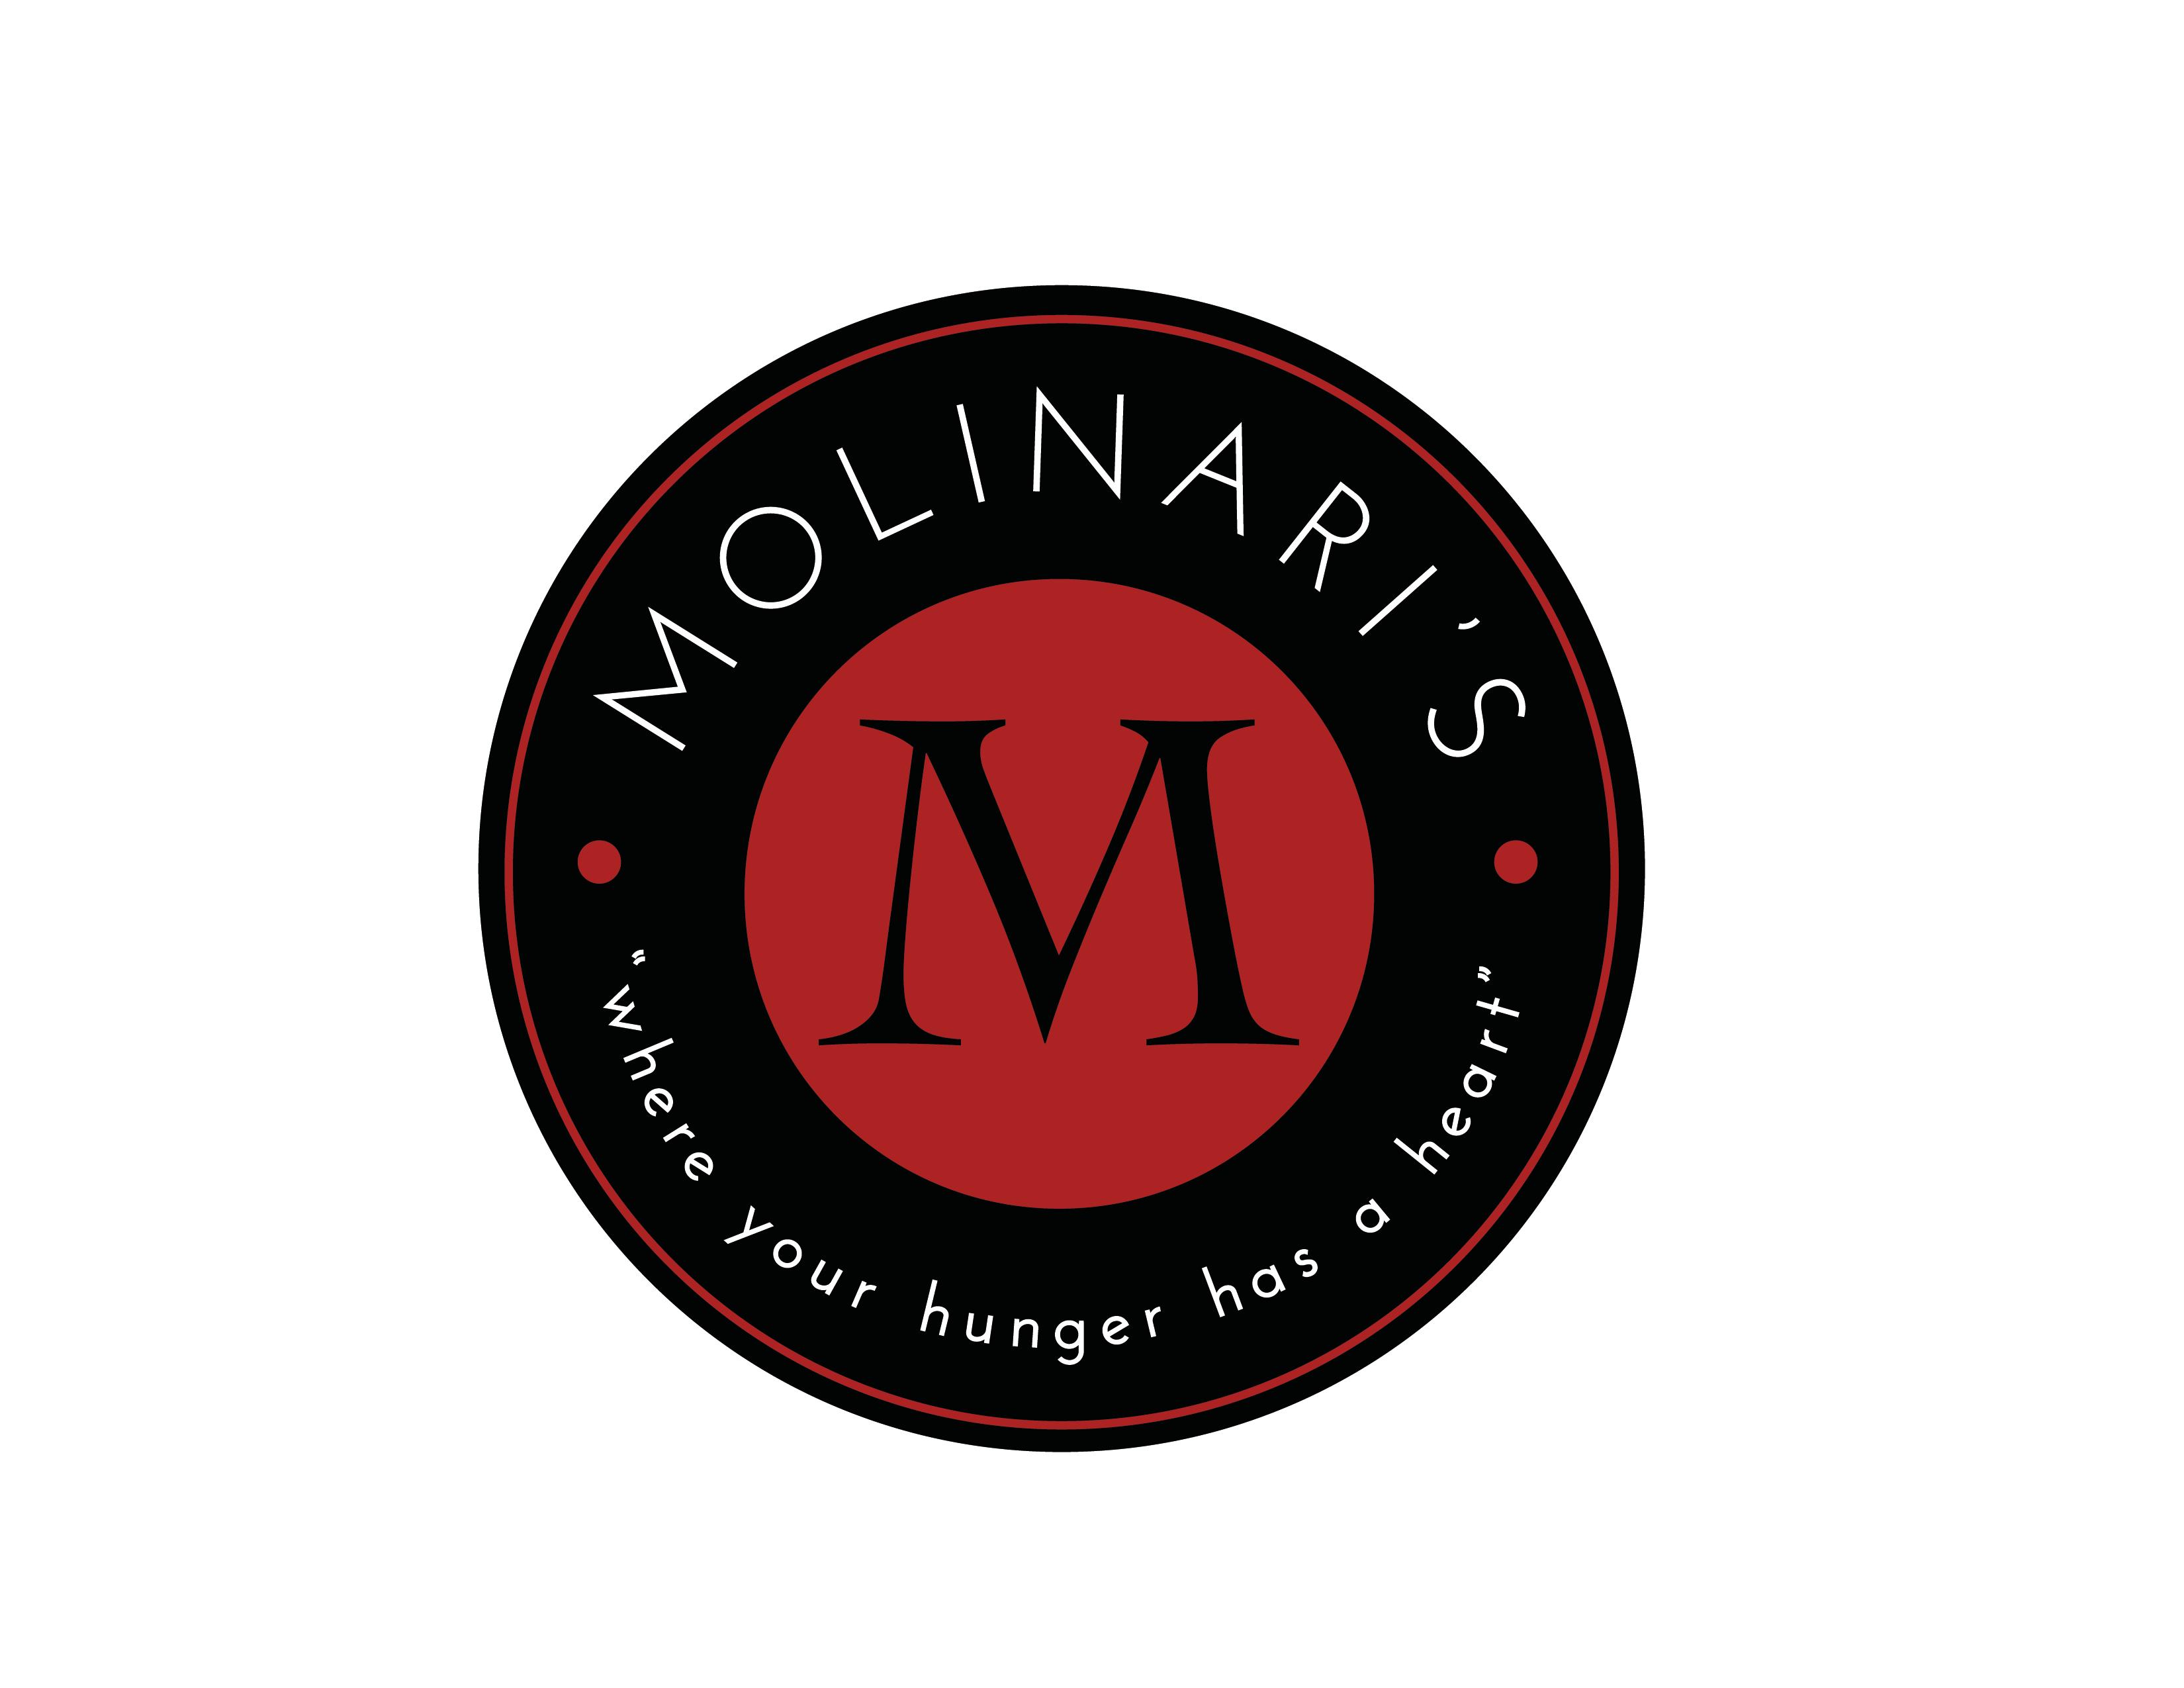 Molinaris